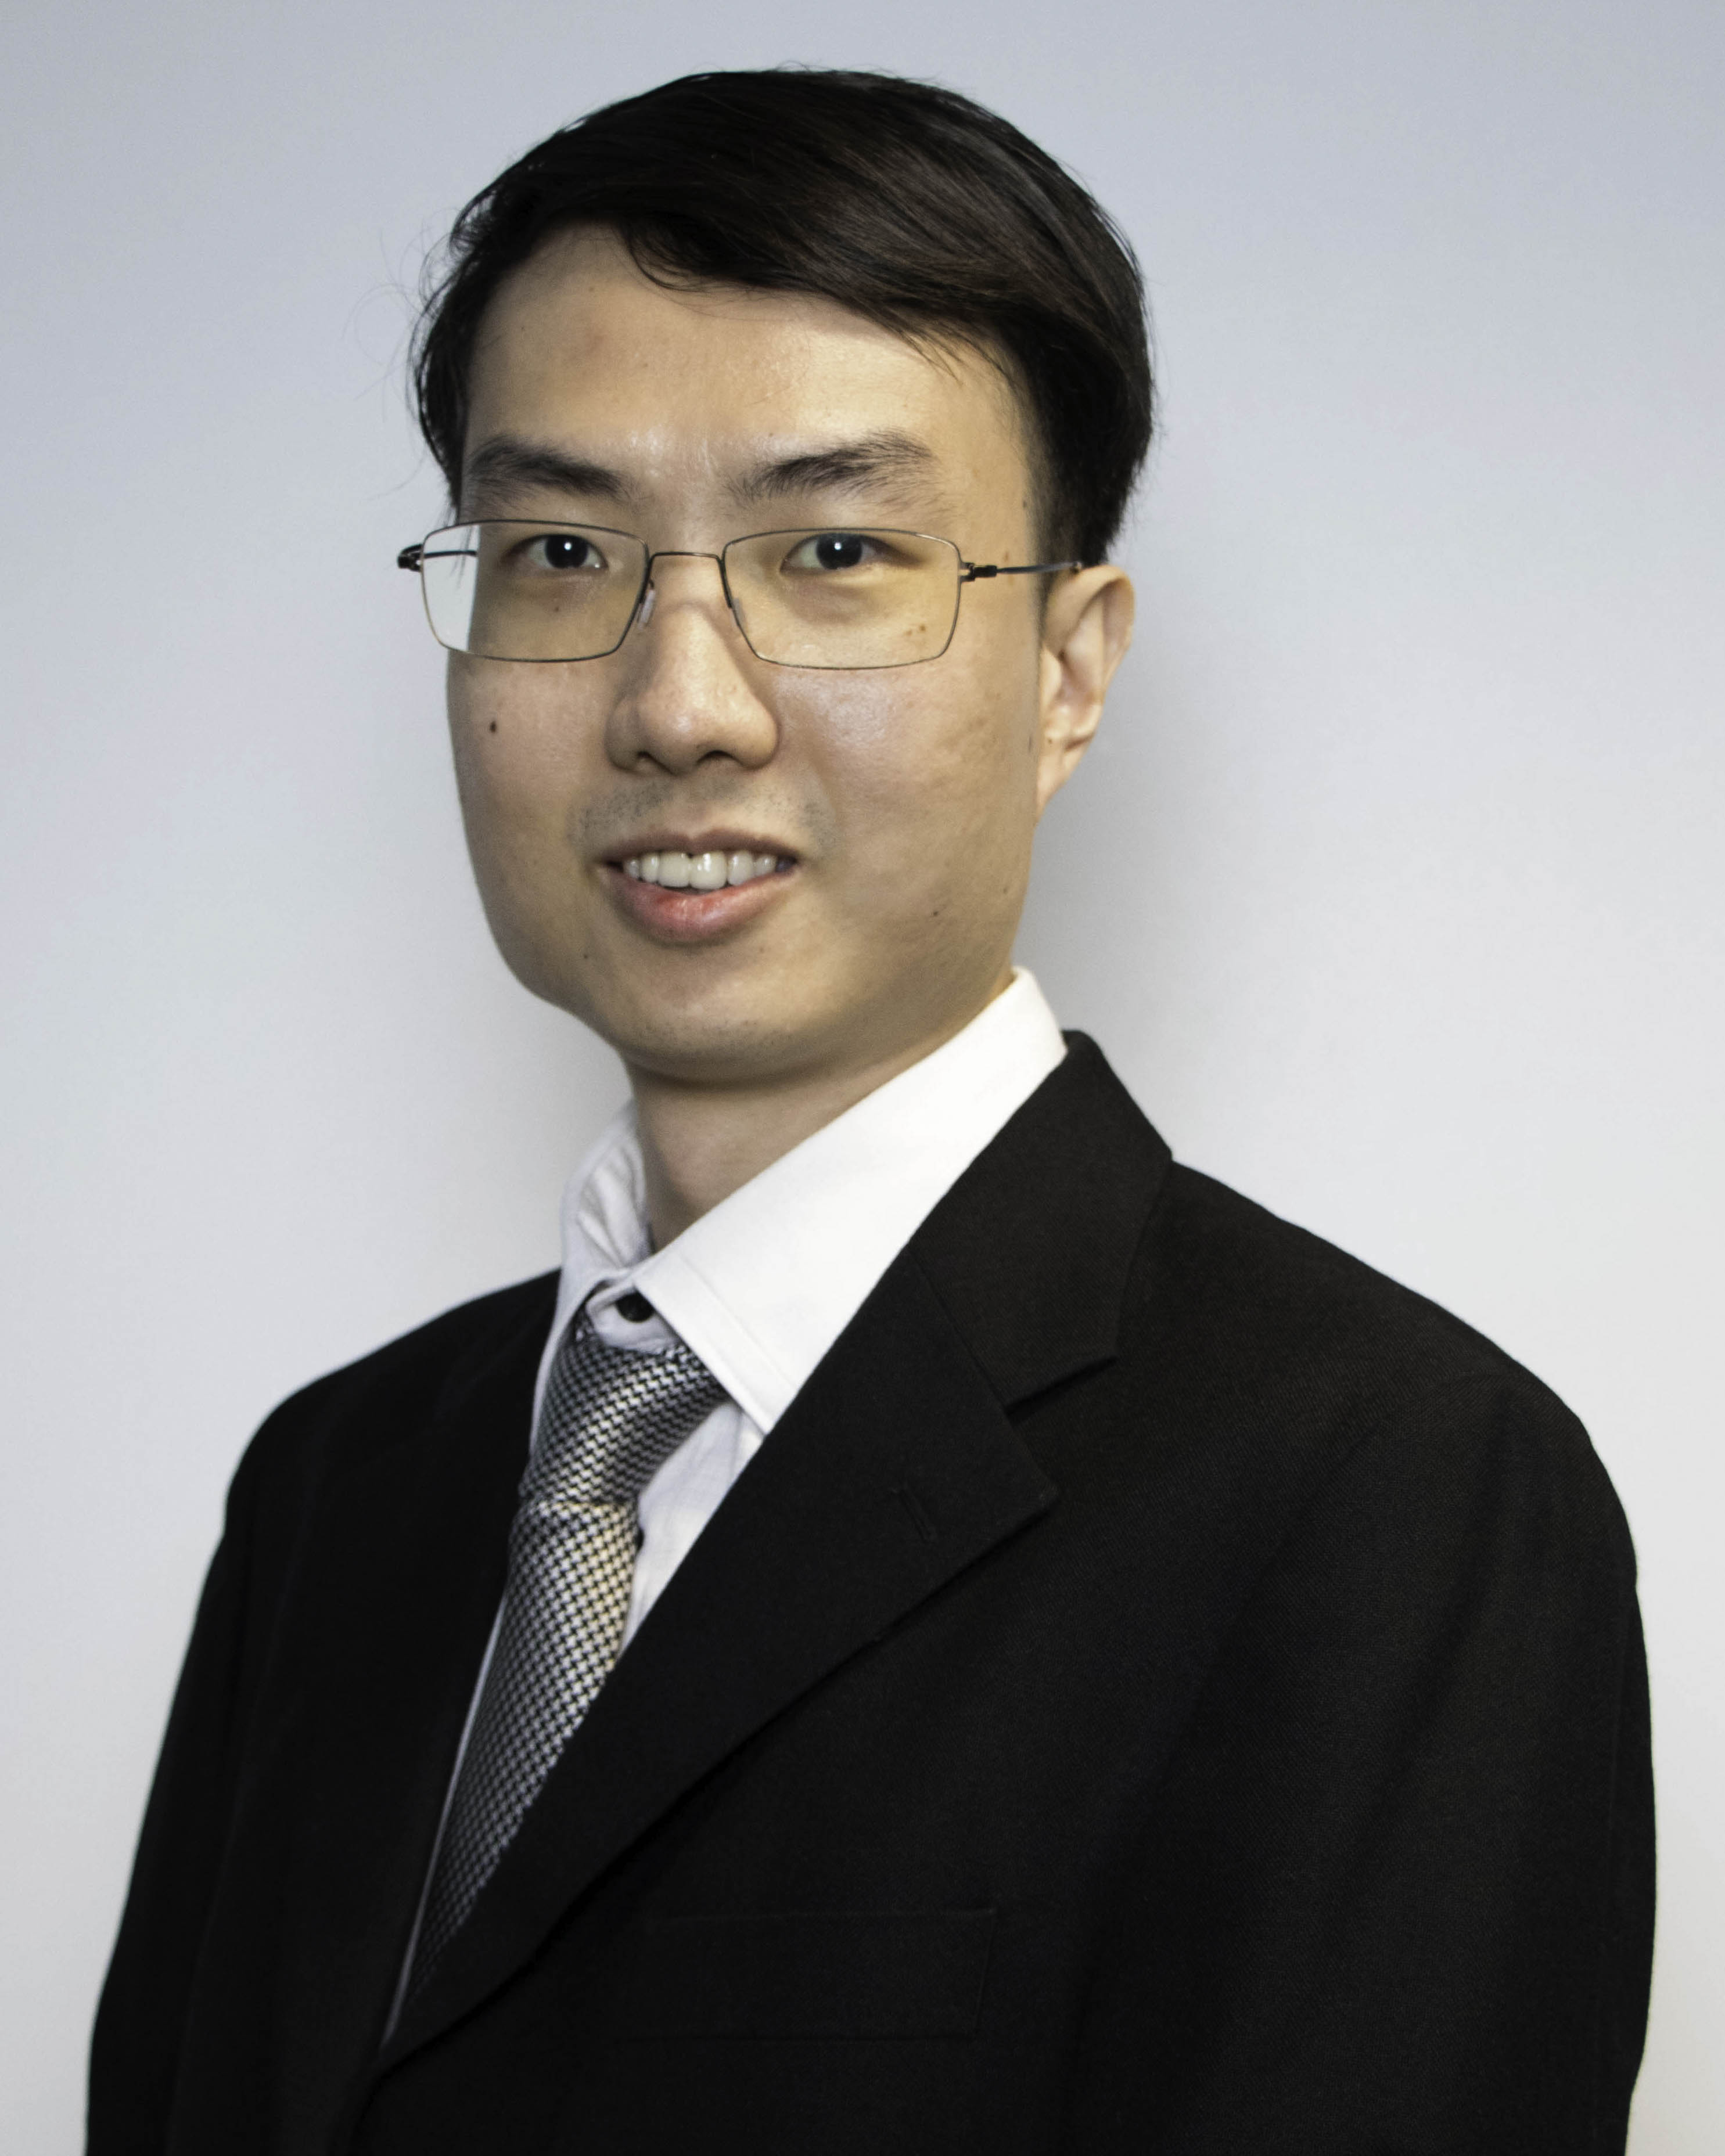 Dr. Tan Chye Cheah